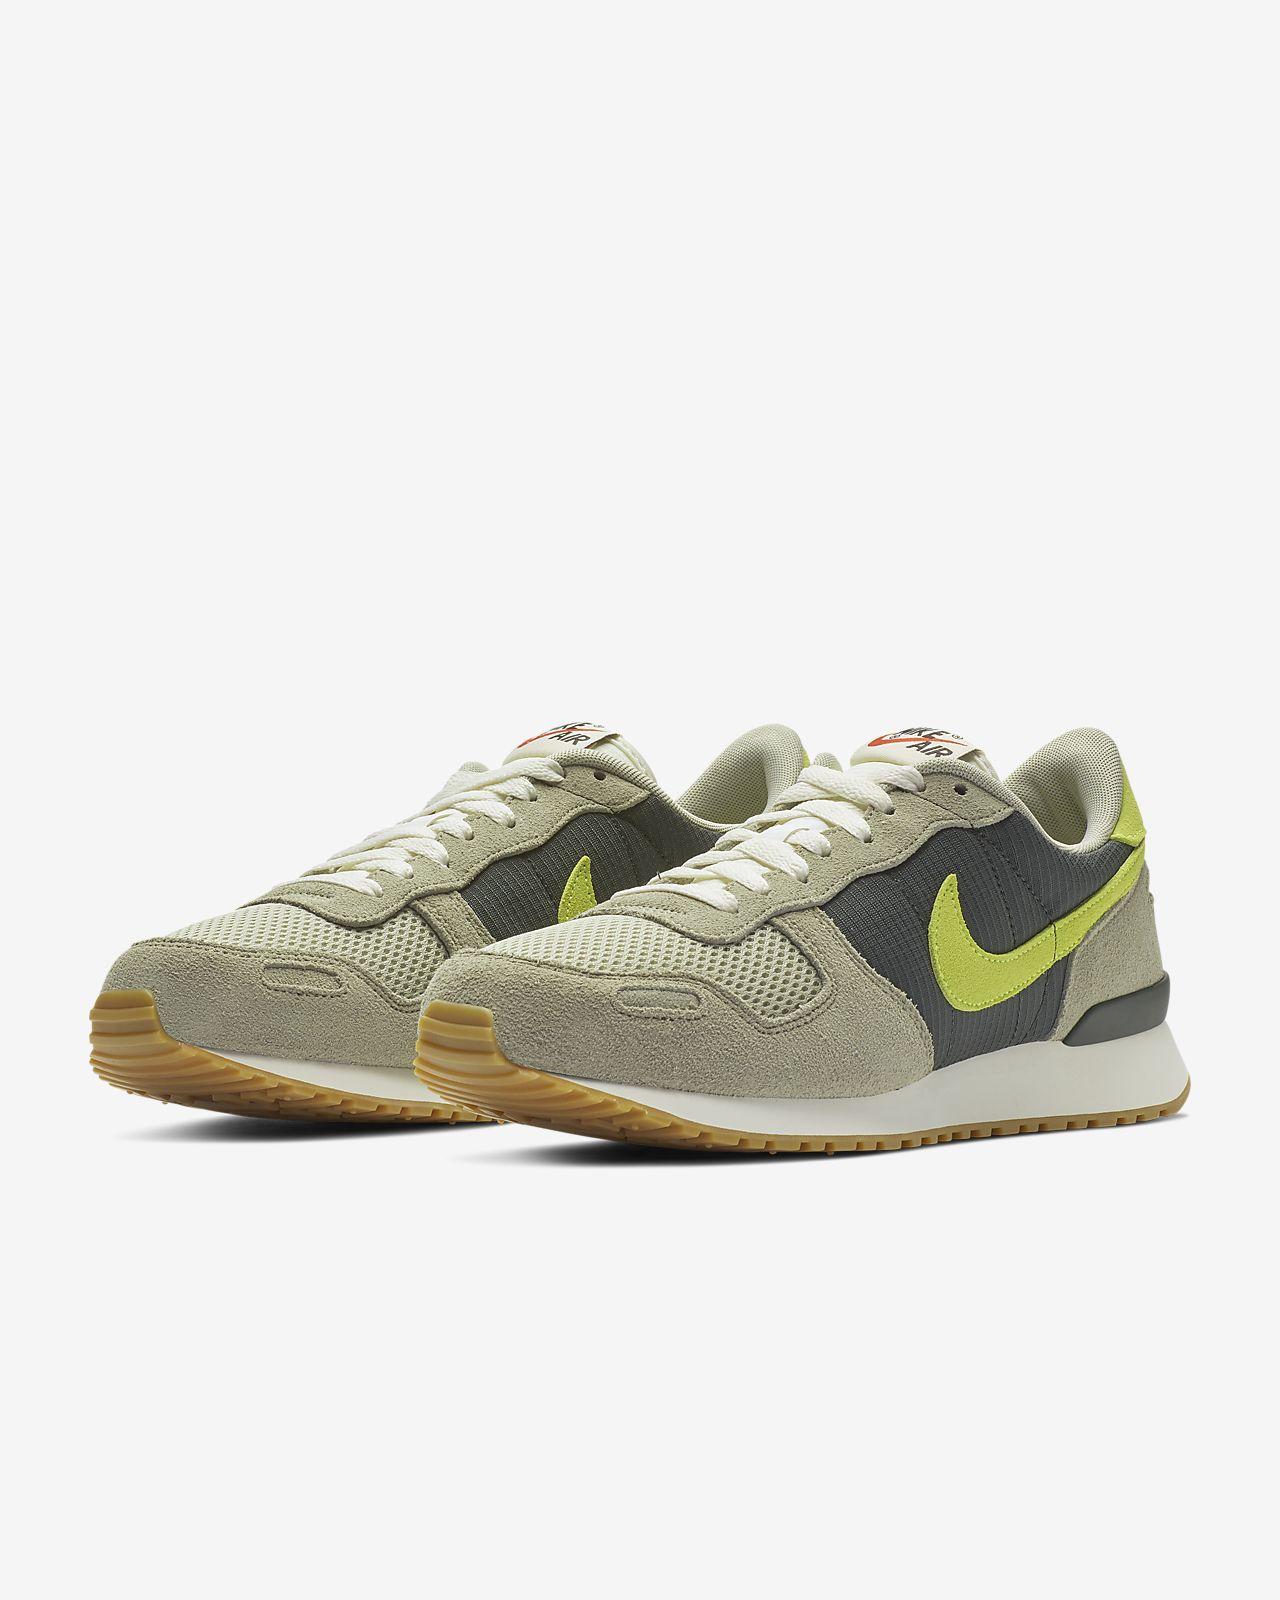 6de2336aacd7 Nike Air Vortex Men s Shoe. Nike.com CA